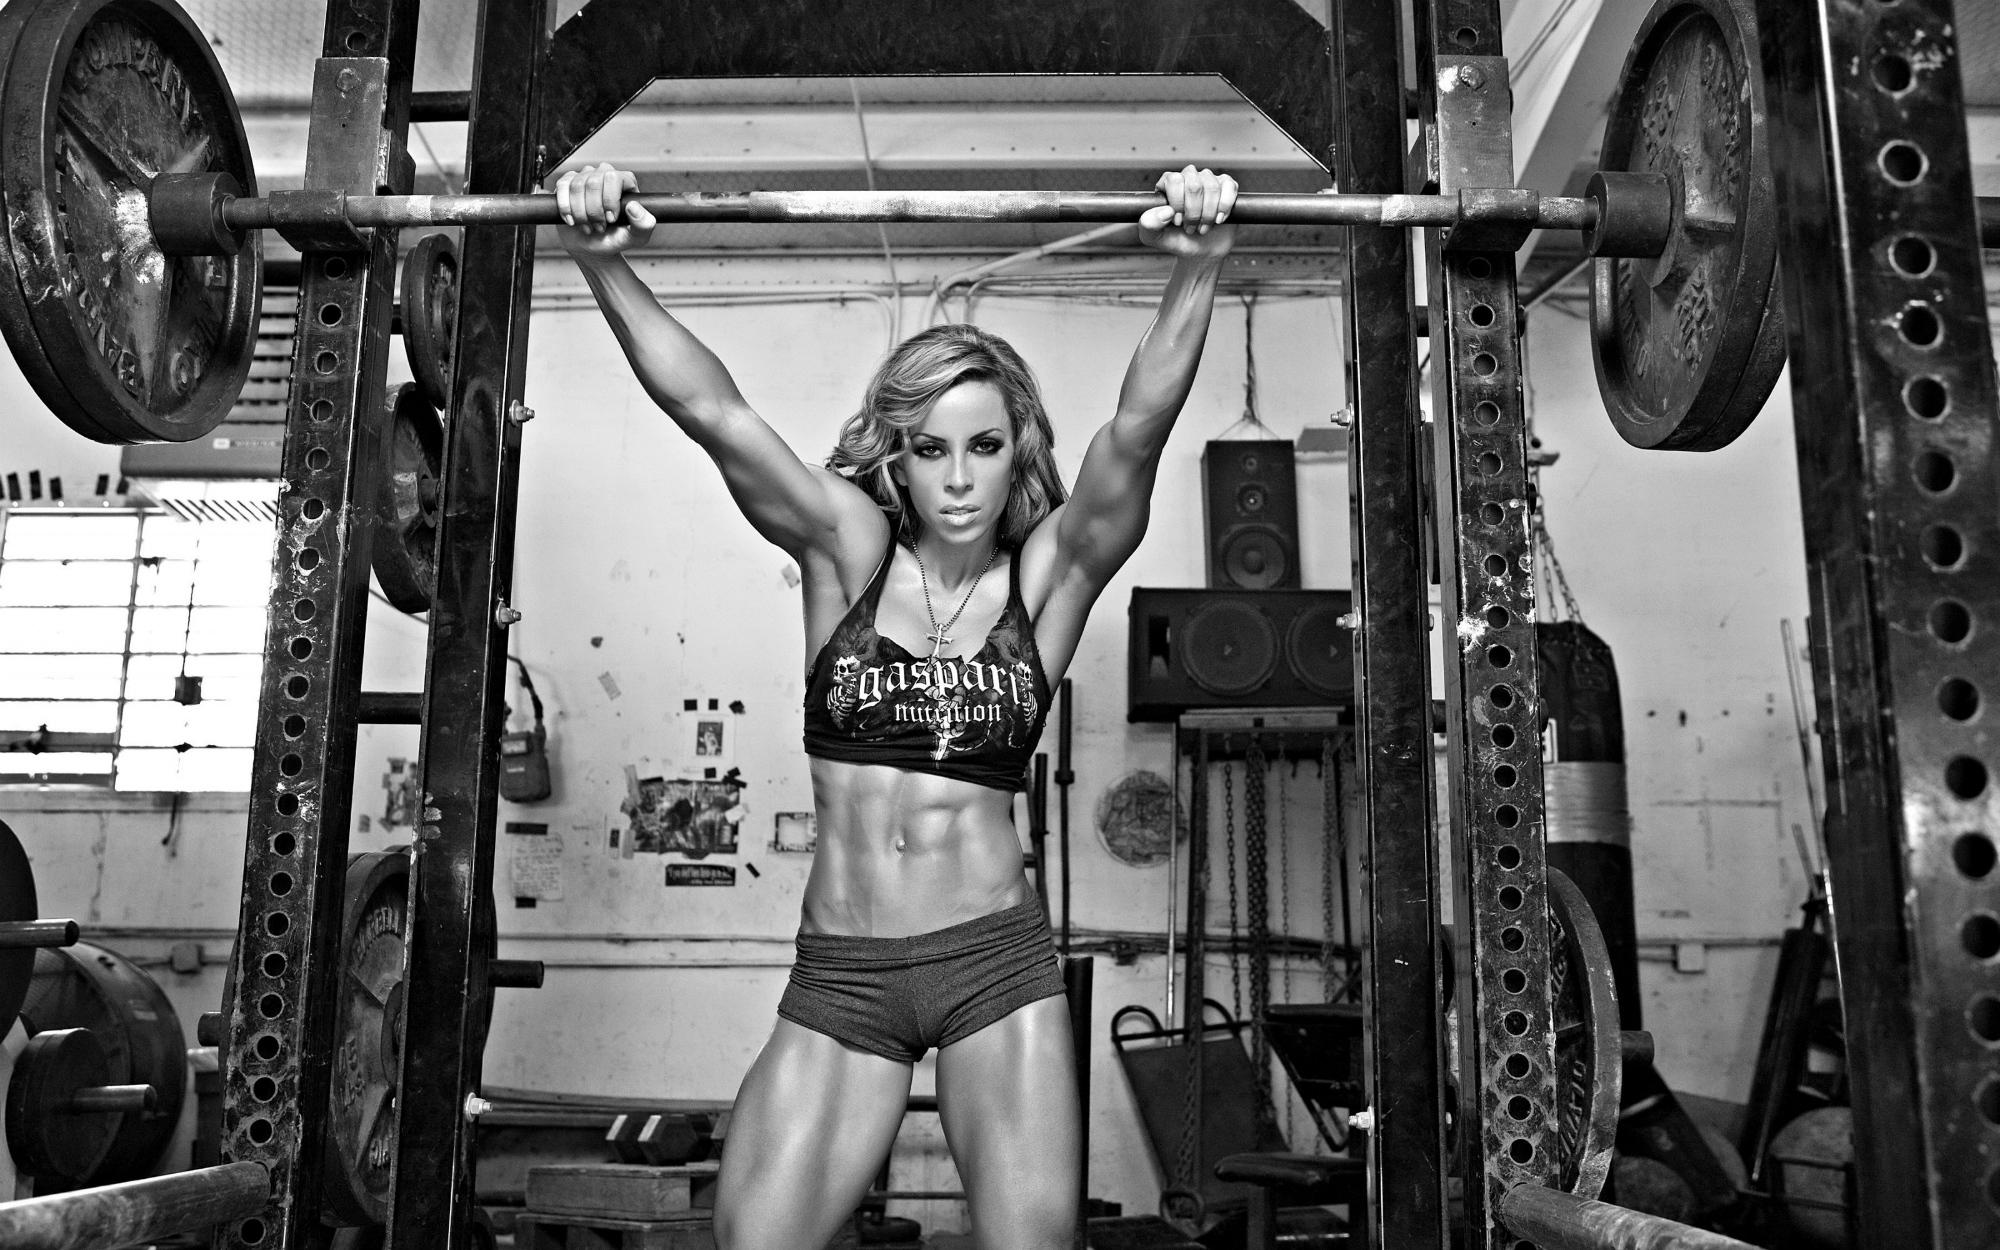 _Women_s_fitness_055598_